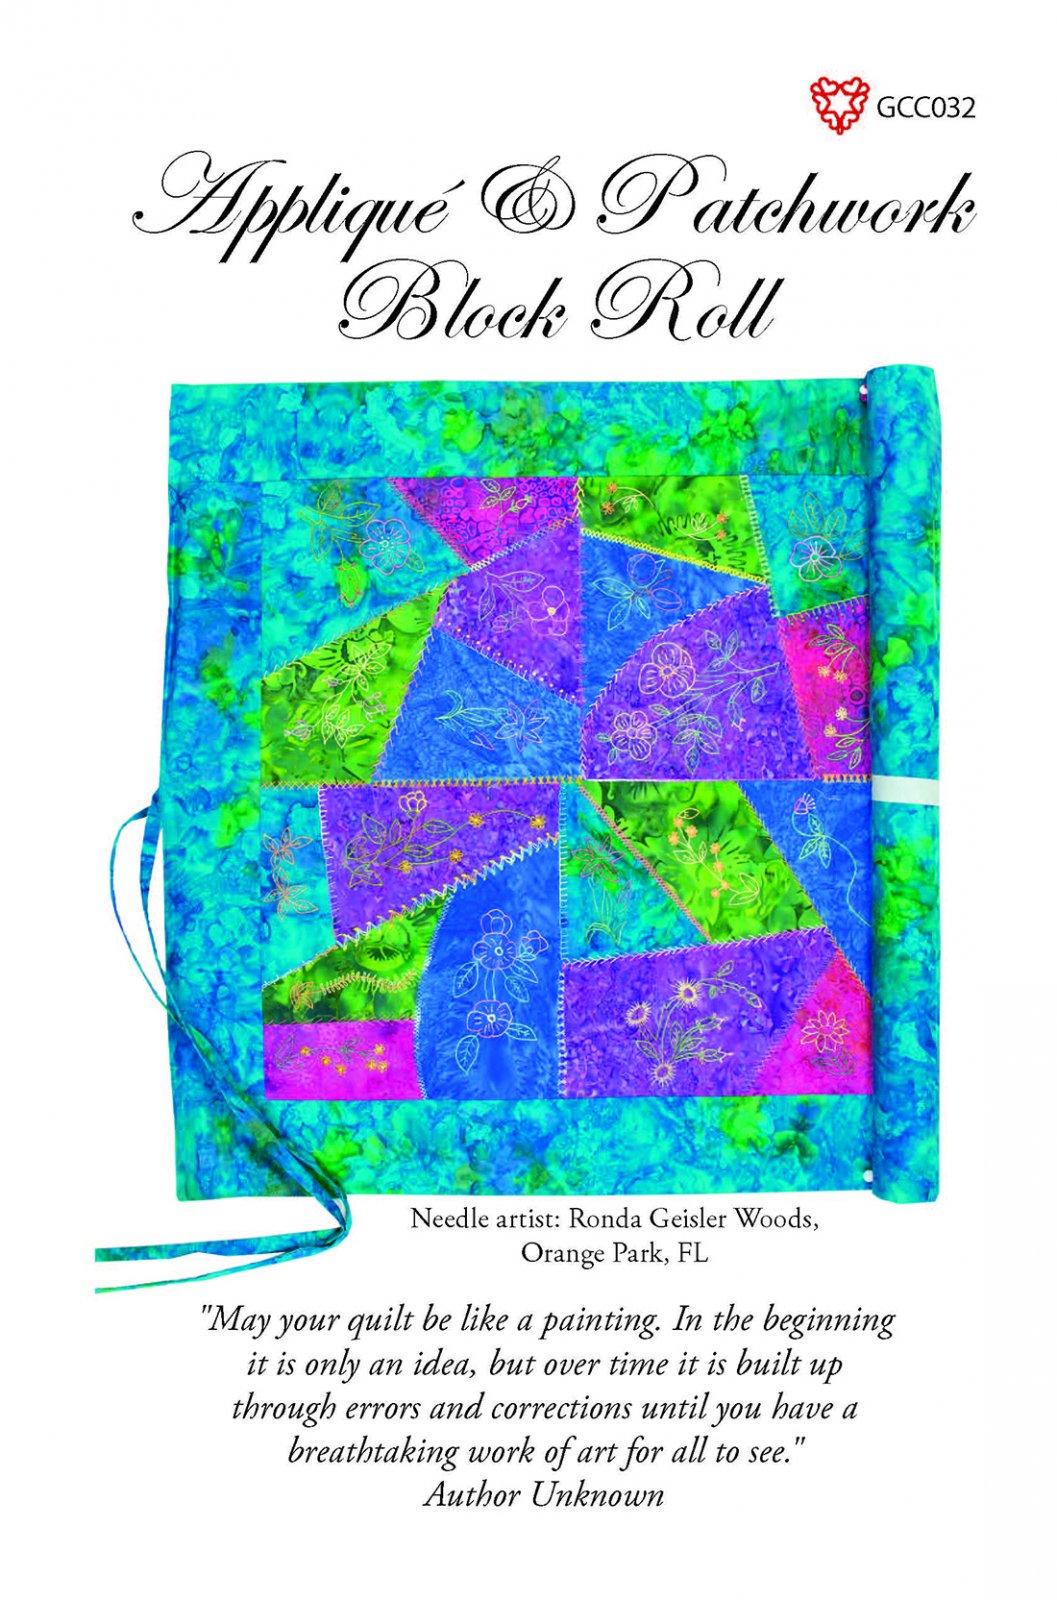 GCC Applique & Patchwork Block Roll